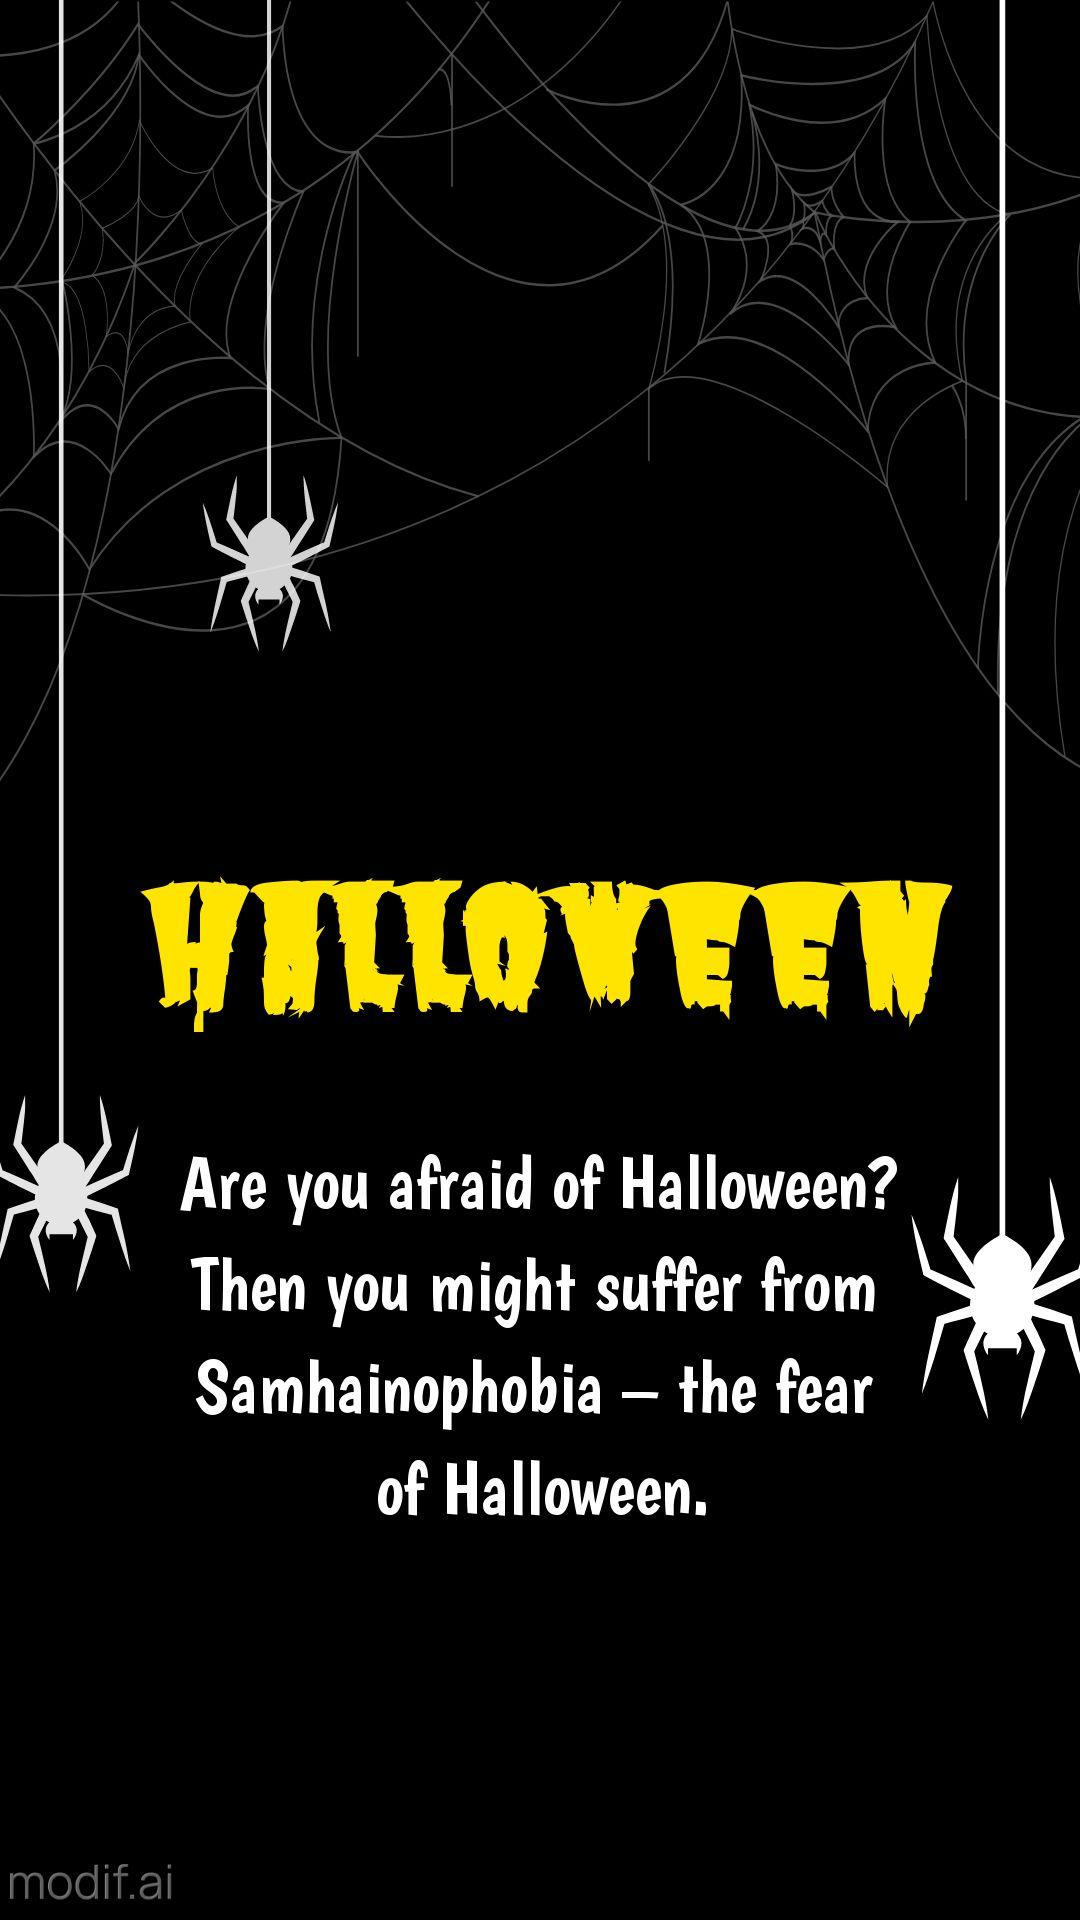 Interesting Halloween Facts Instagram Story